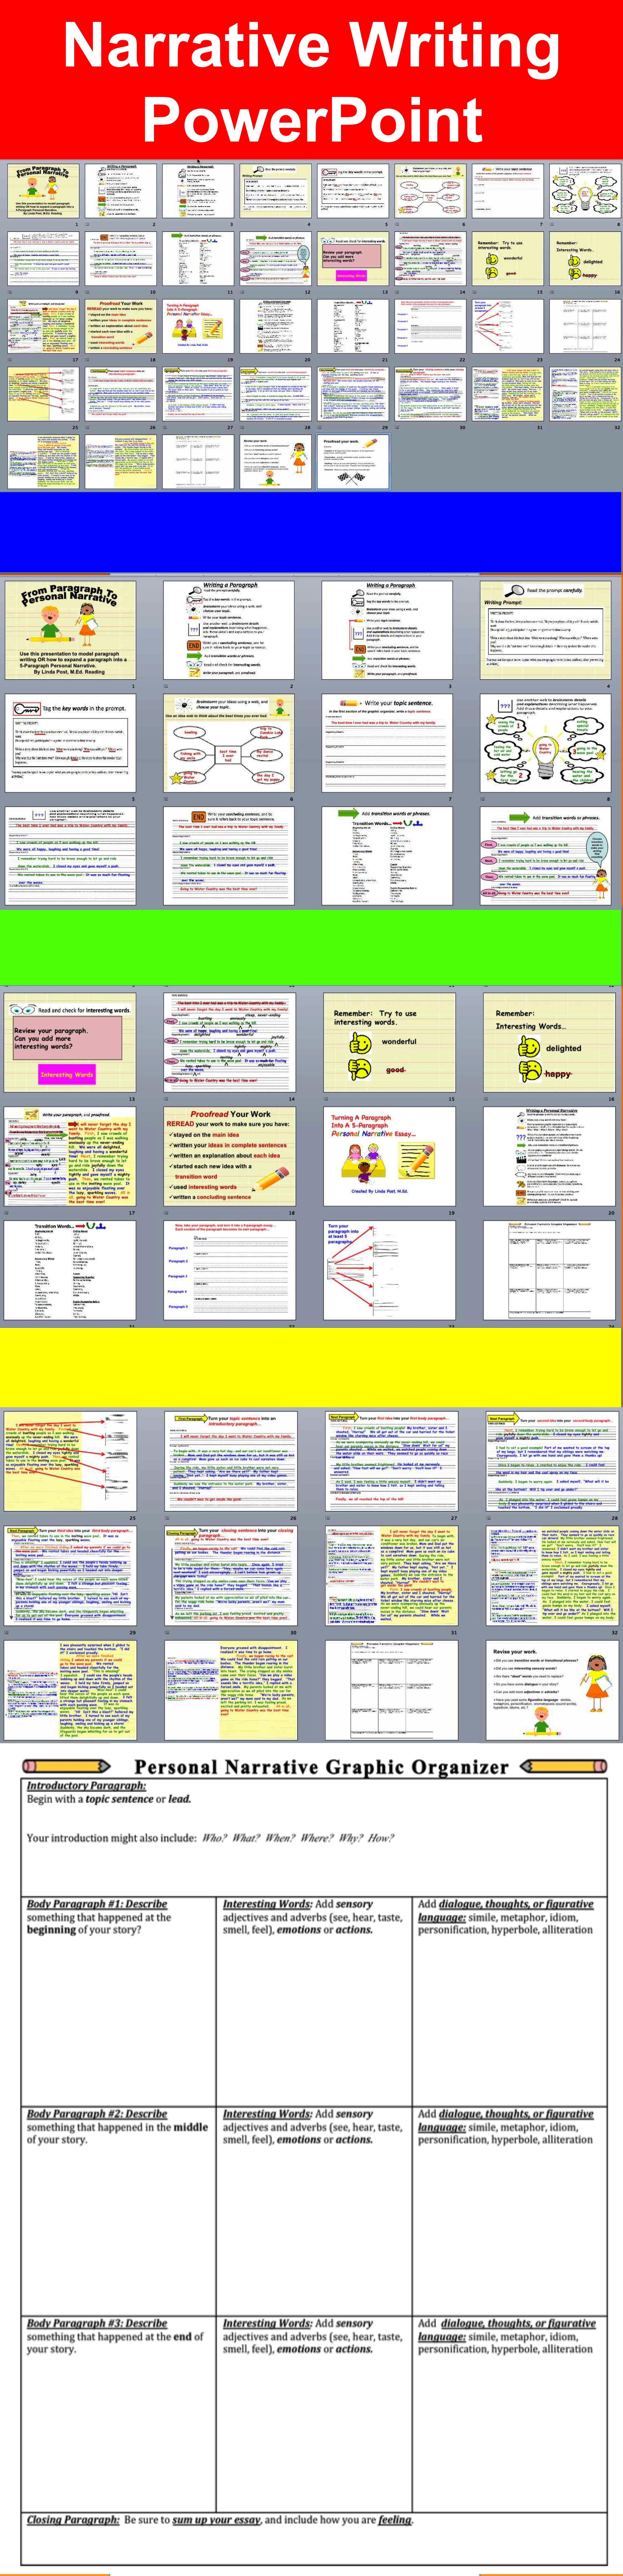 Dissertation methodology writing service gb